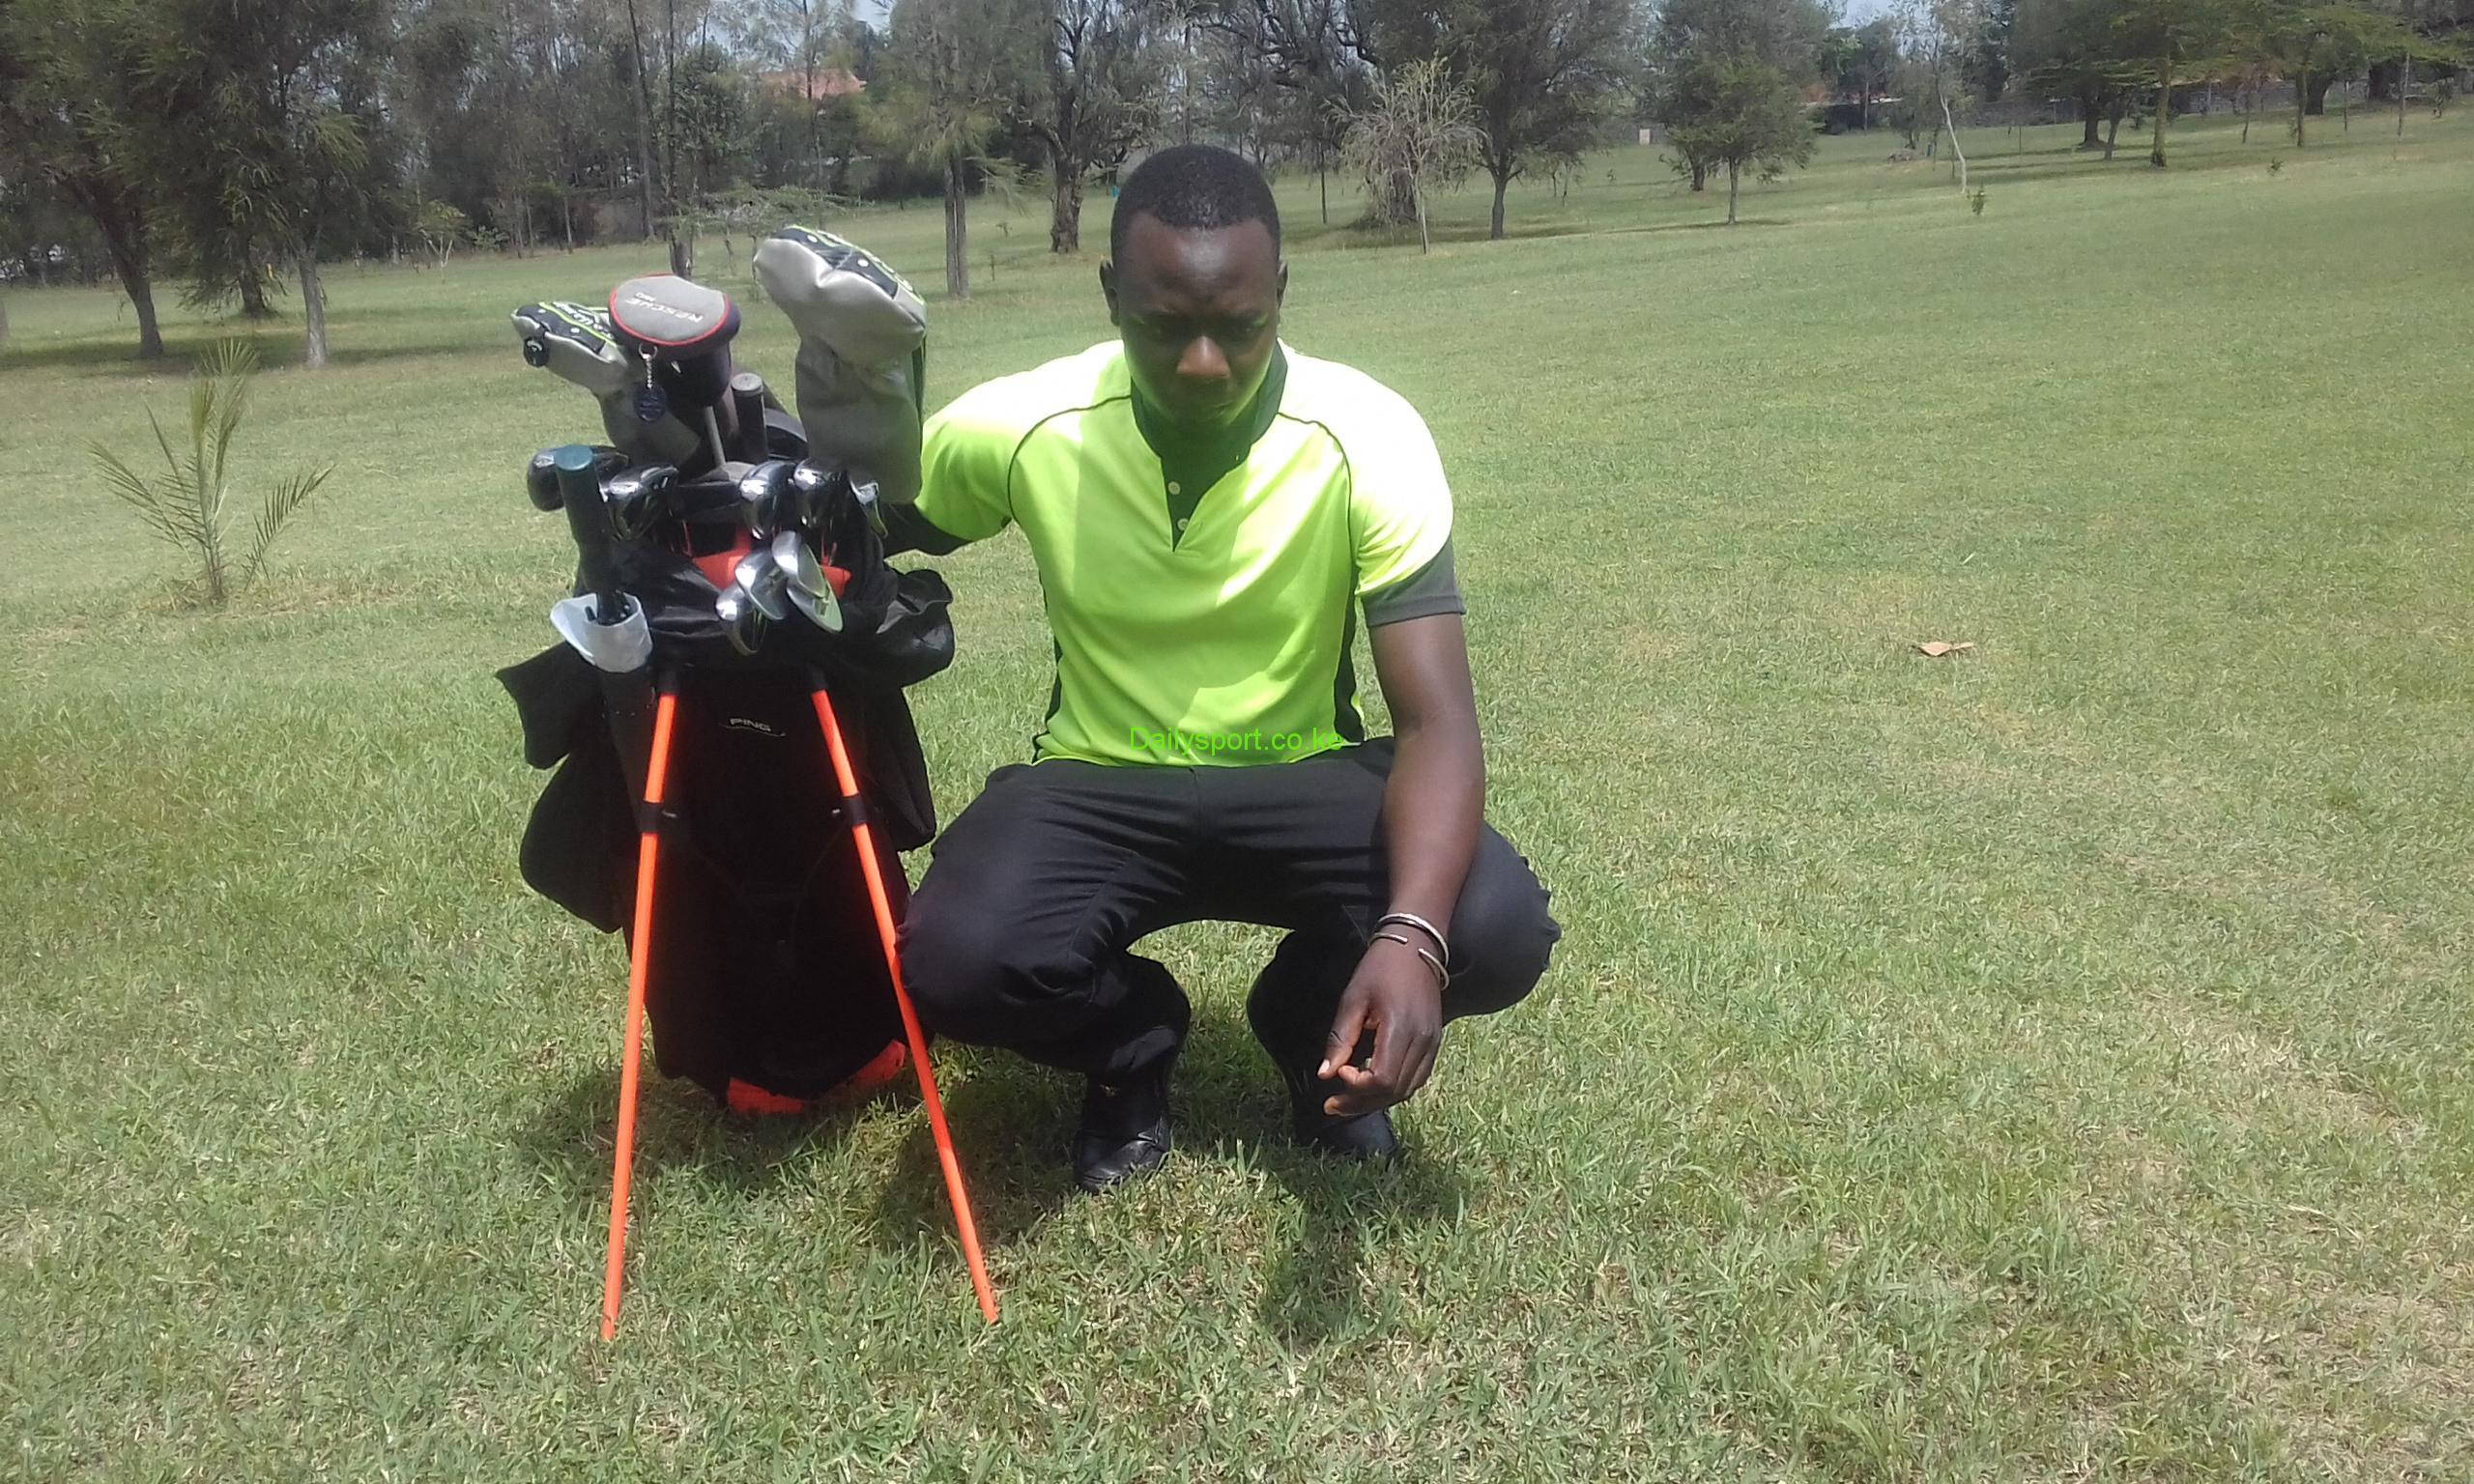 Charles Odhiambo, Coronation and Bendor Trophy, Coronation Trophy, Uhuru Kenyatta, President Uhuru Kenyatta, Barclays Bank Kenya Open, Kenya open golf, Isaac Makokha,